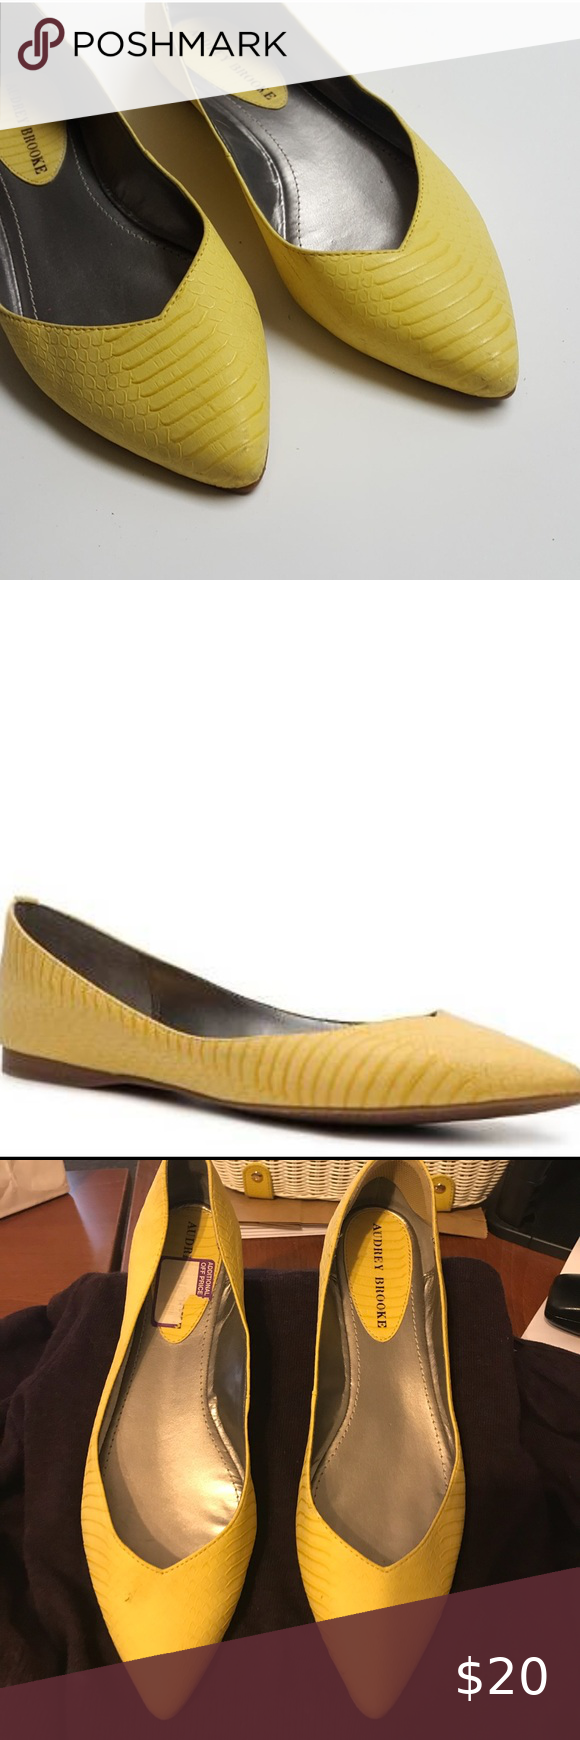 DSW Audrey Brooke Pointy Toe Flat DSW's